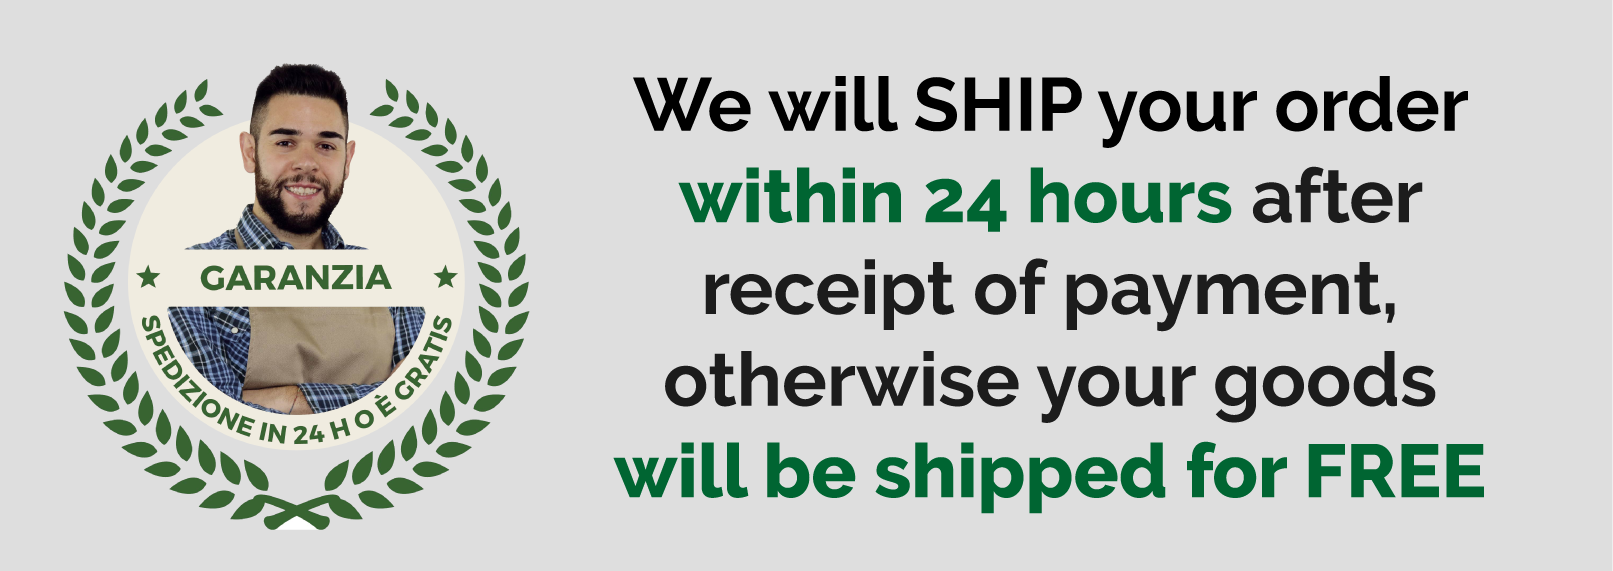 Shipment guarantee